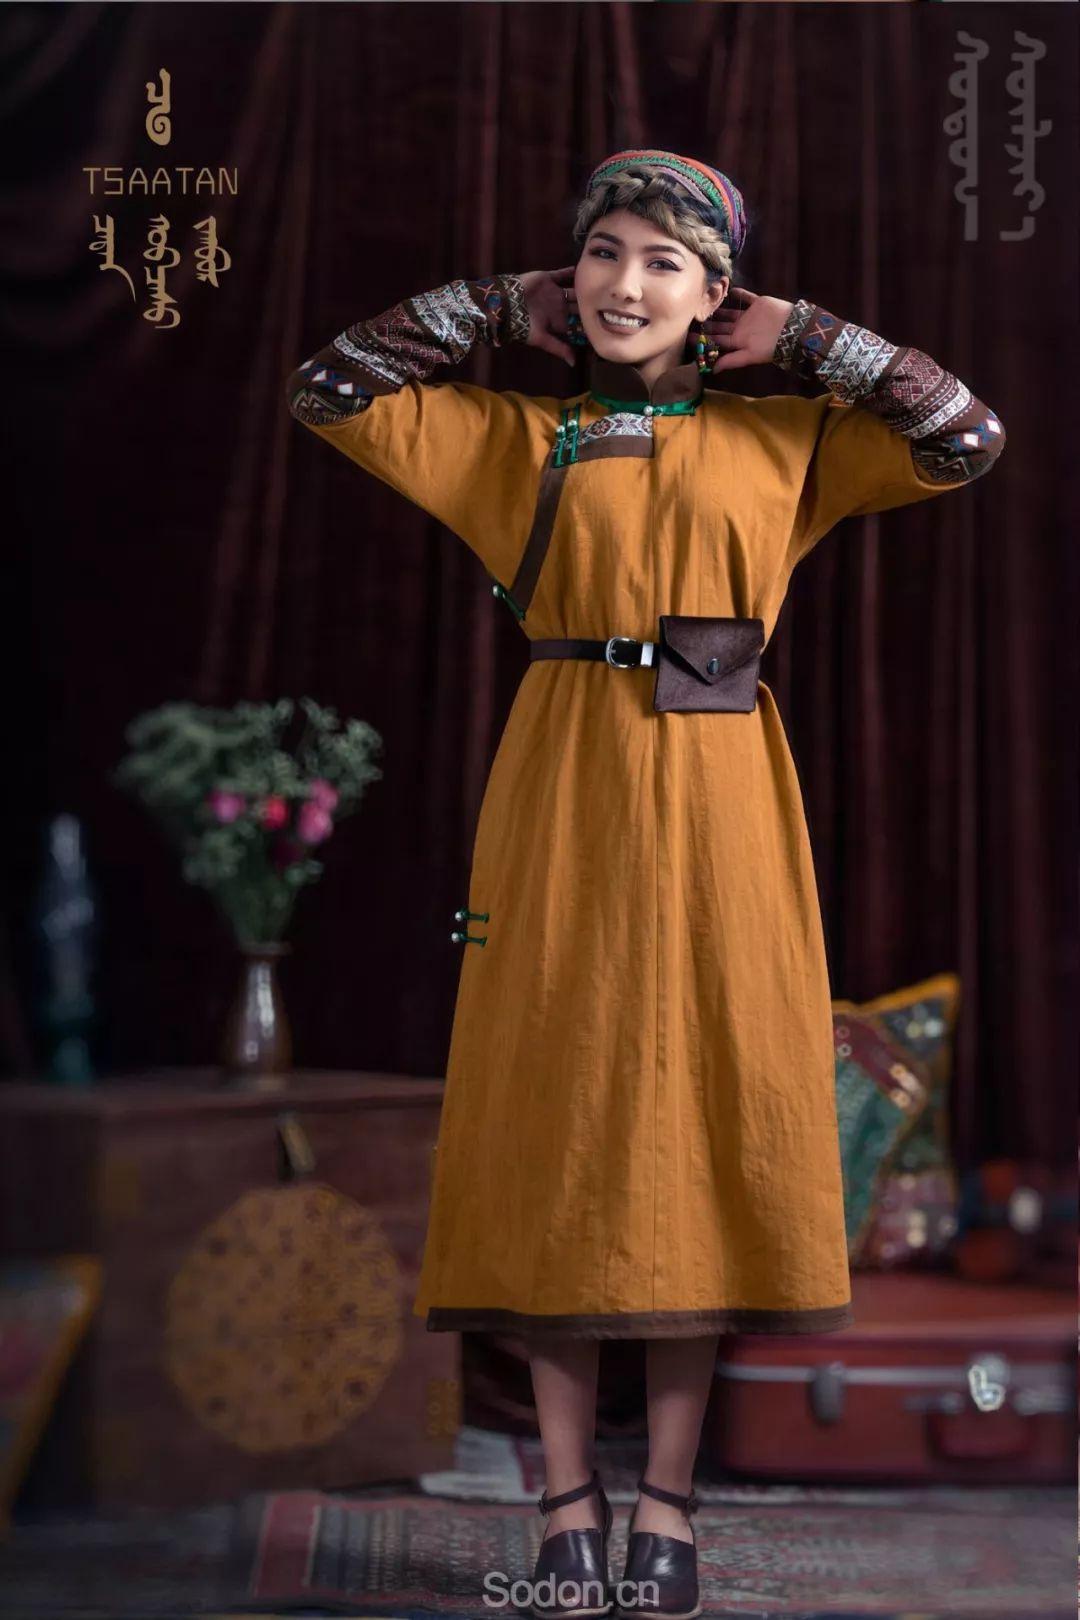 TSAATAN蒙古时装 2019夏季新款首发 第51张